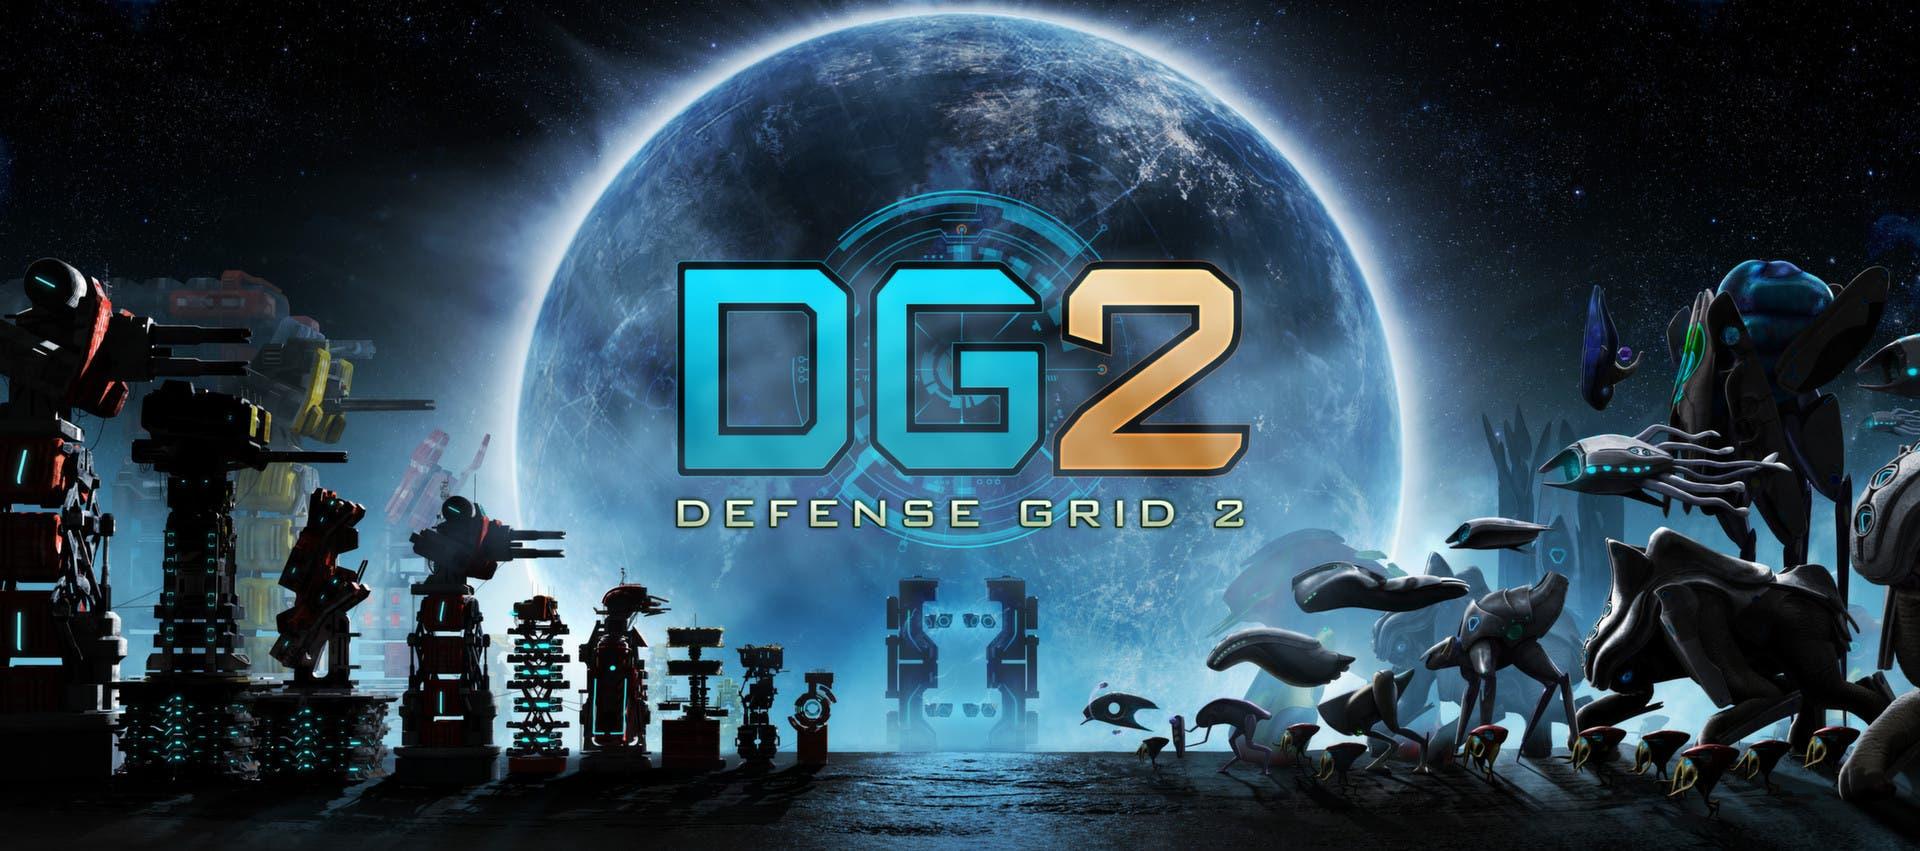 DefenseGrid2 featured